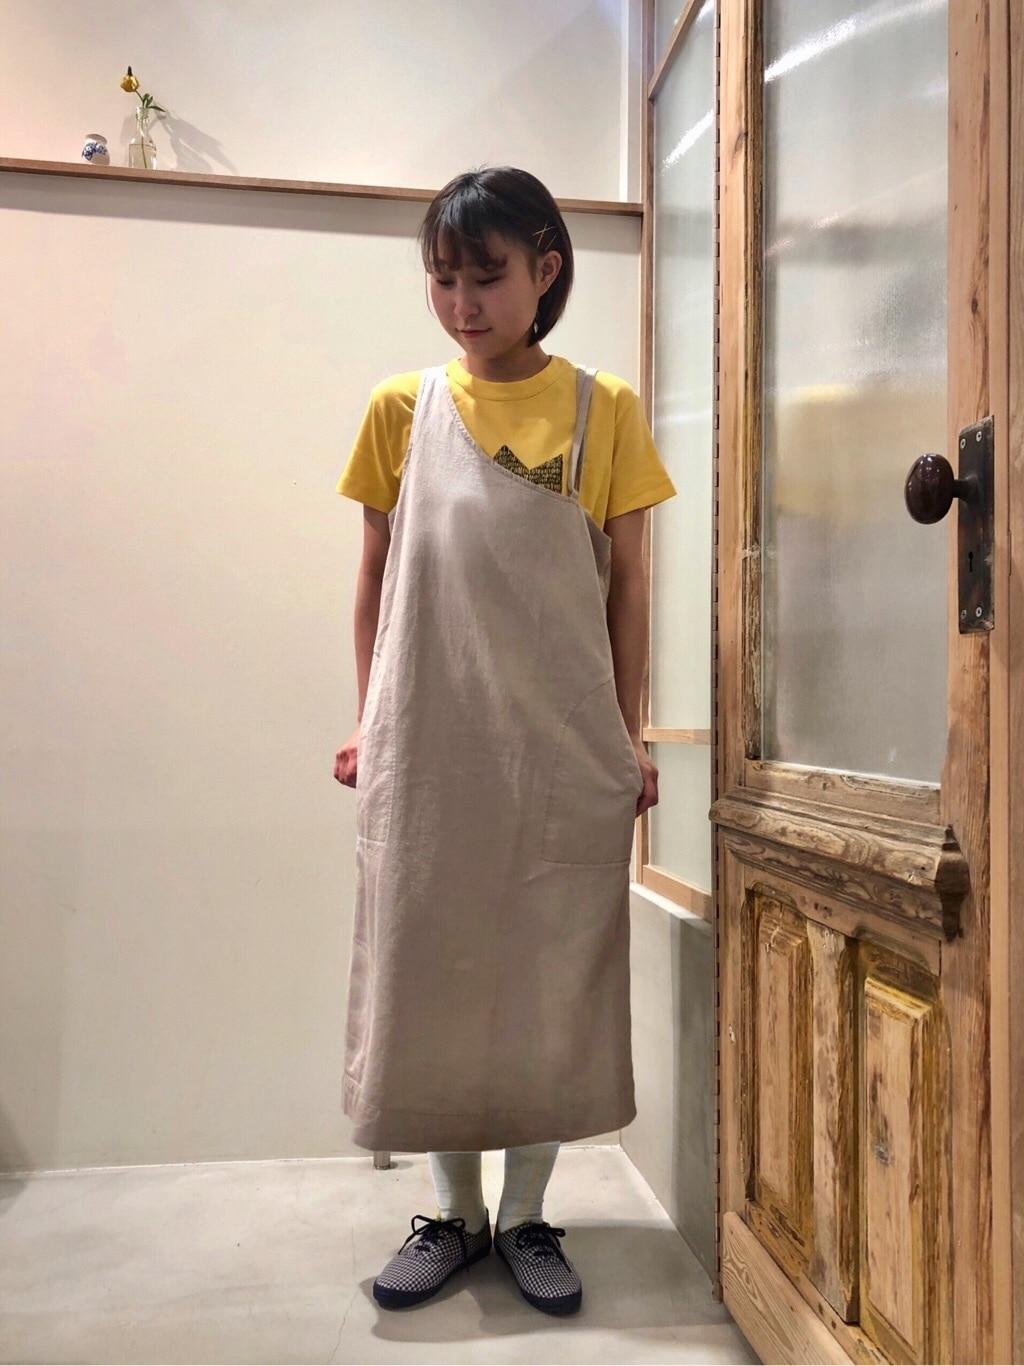 bulle de savon 渋谷スクランブルスクエア 身長:159cm 2020.03.13